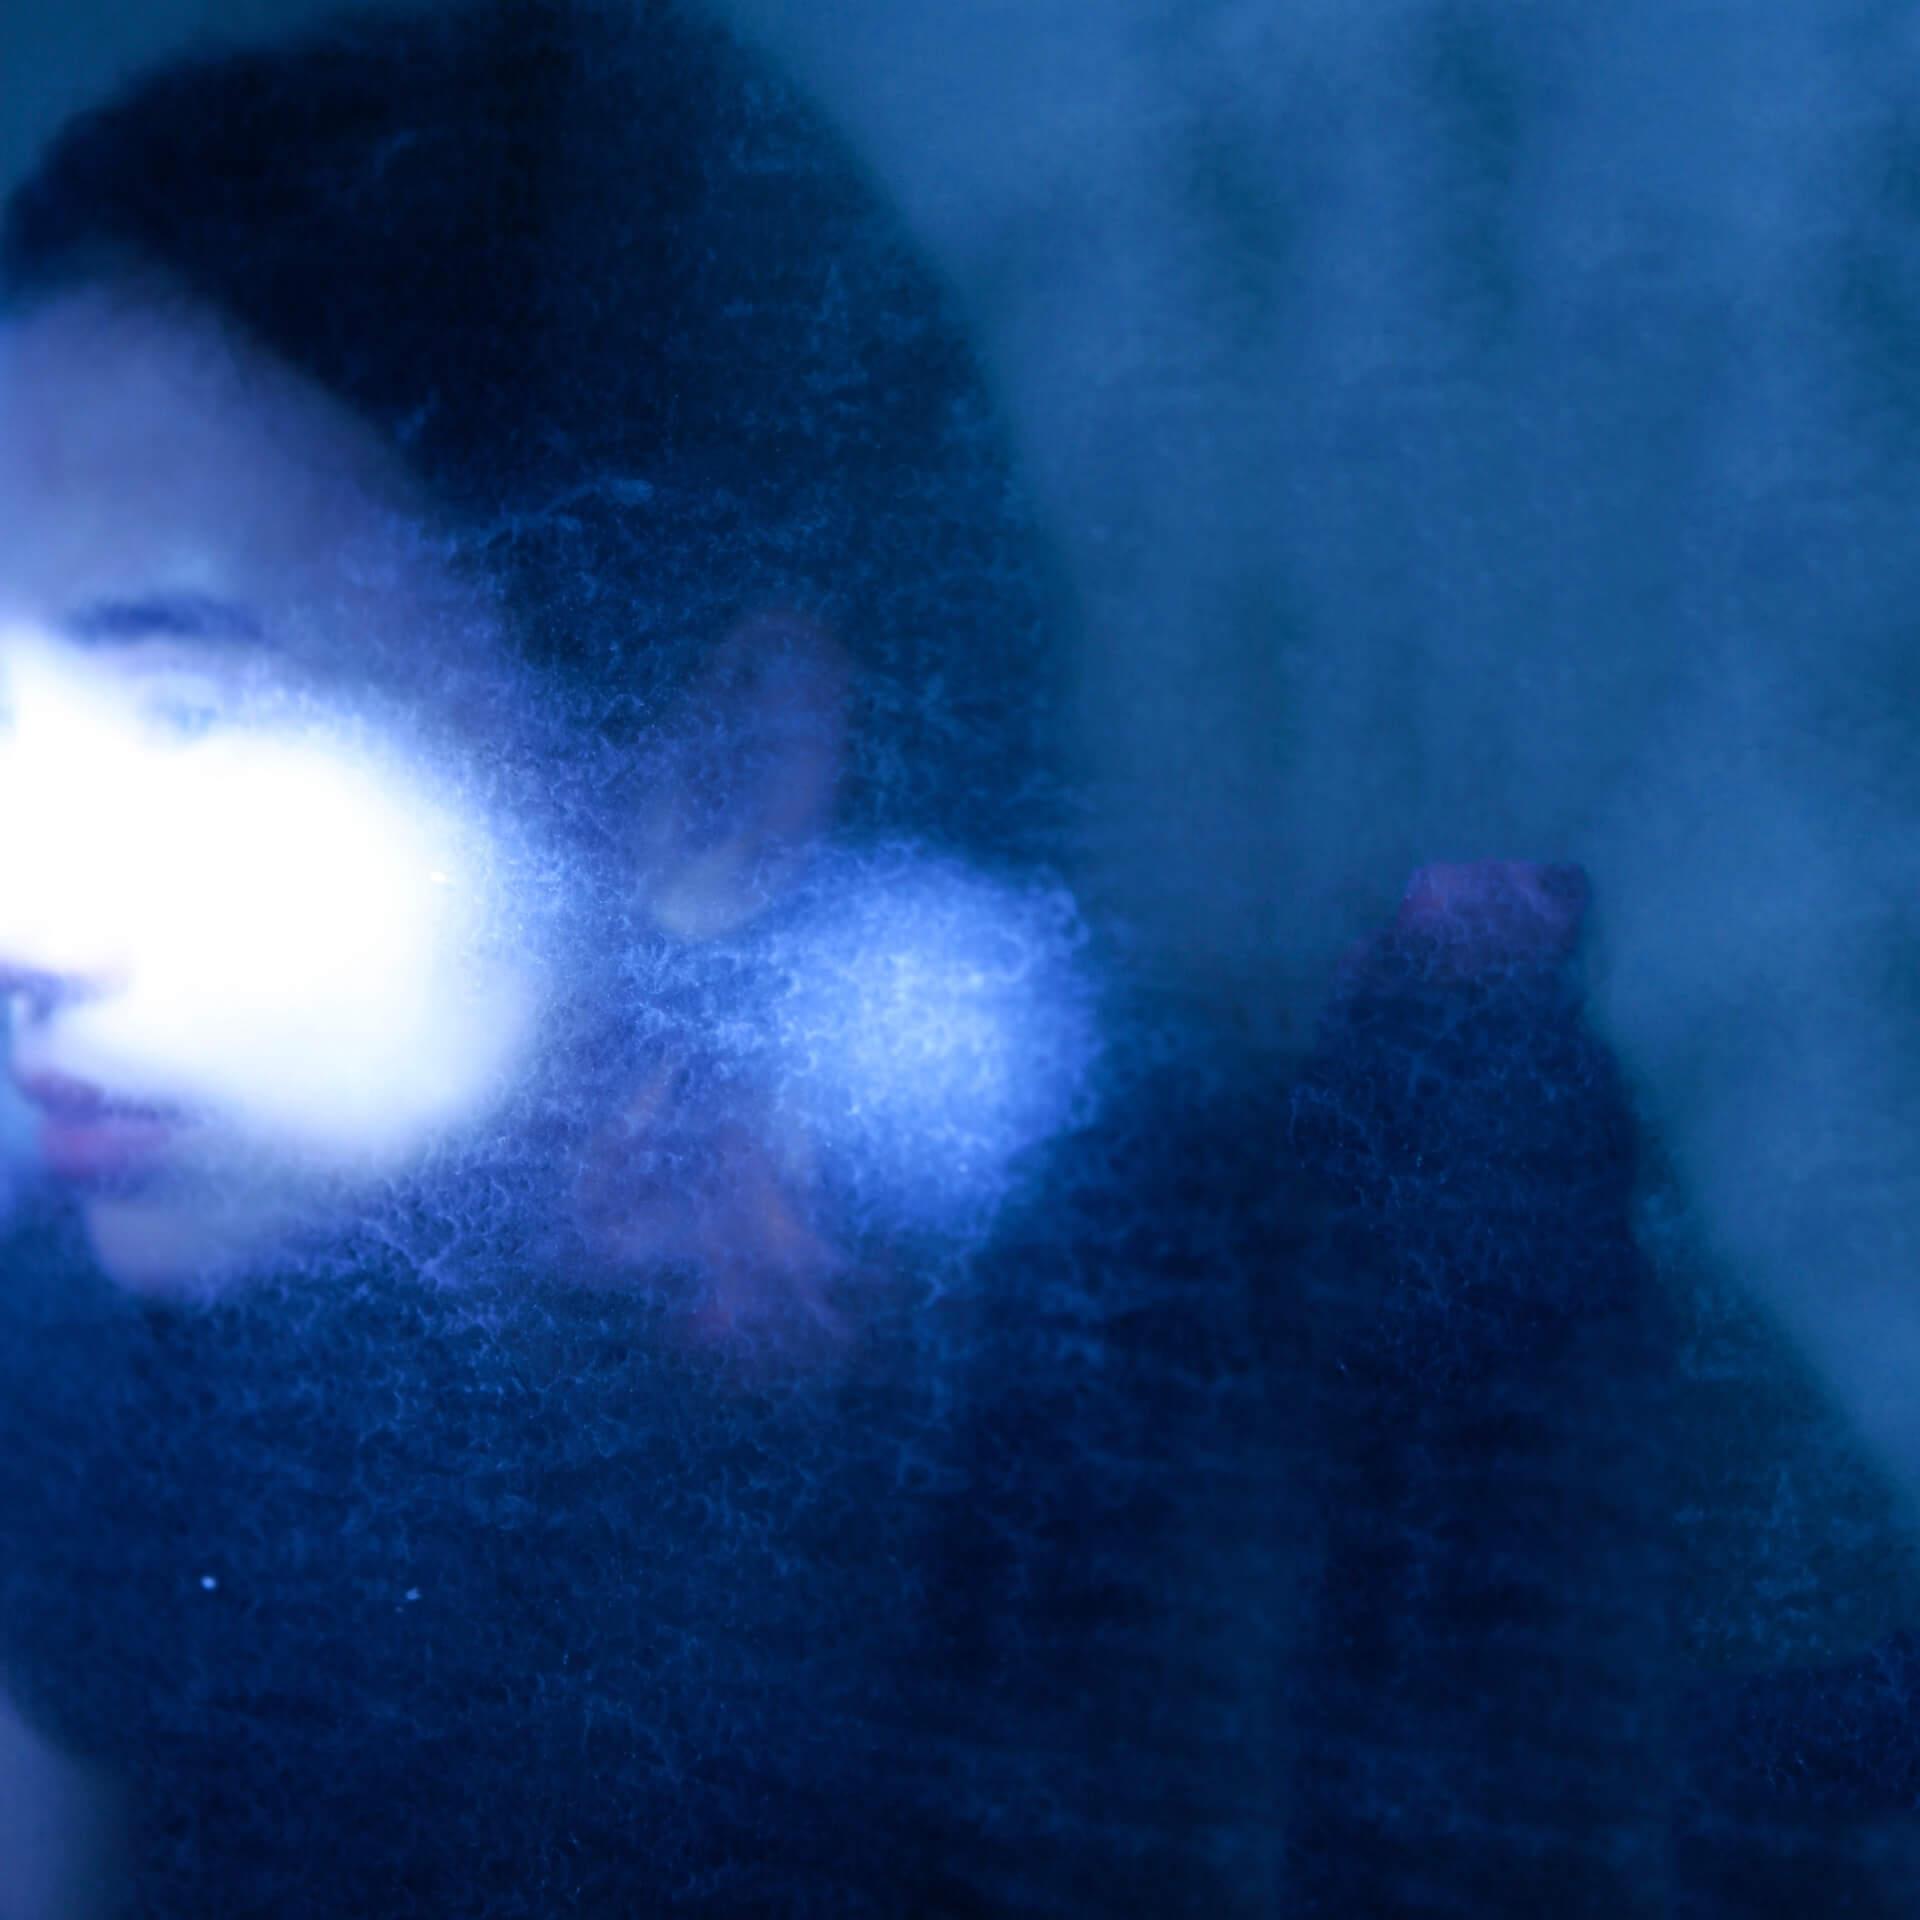 "Black Boboiのメンバー、Julia Shortreed初のアルバム『Violet Sun』が発売決定|先行曲""Wild Rose""がリリース&Tatsuya FujimotoによるMVも解禁 music210108_juliashortreed_1"